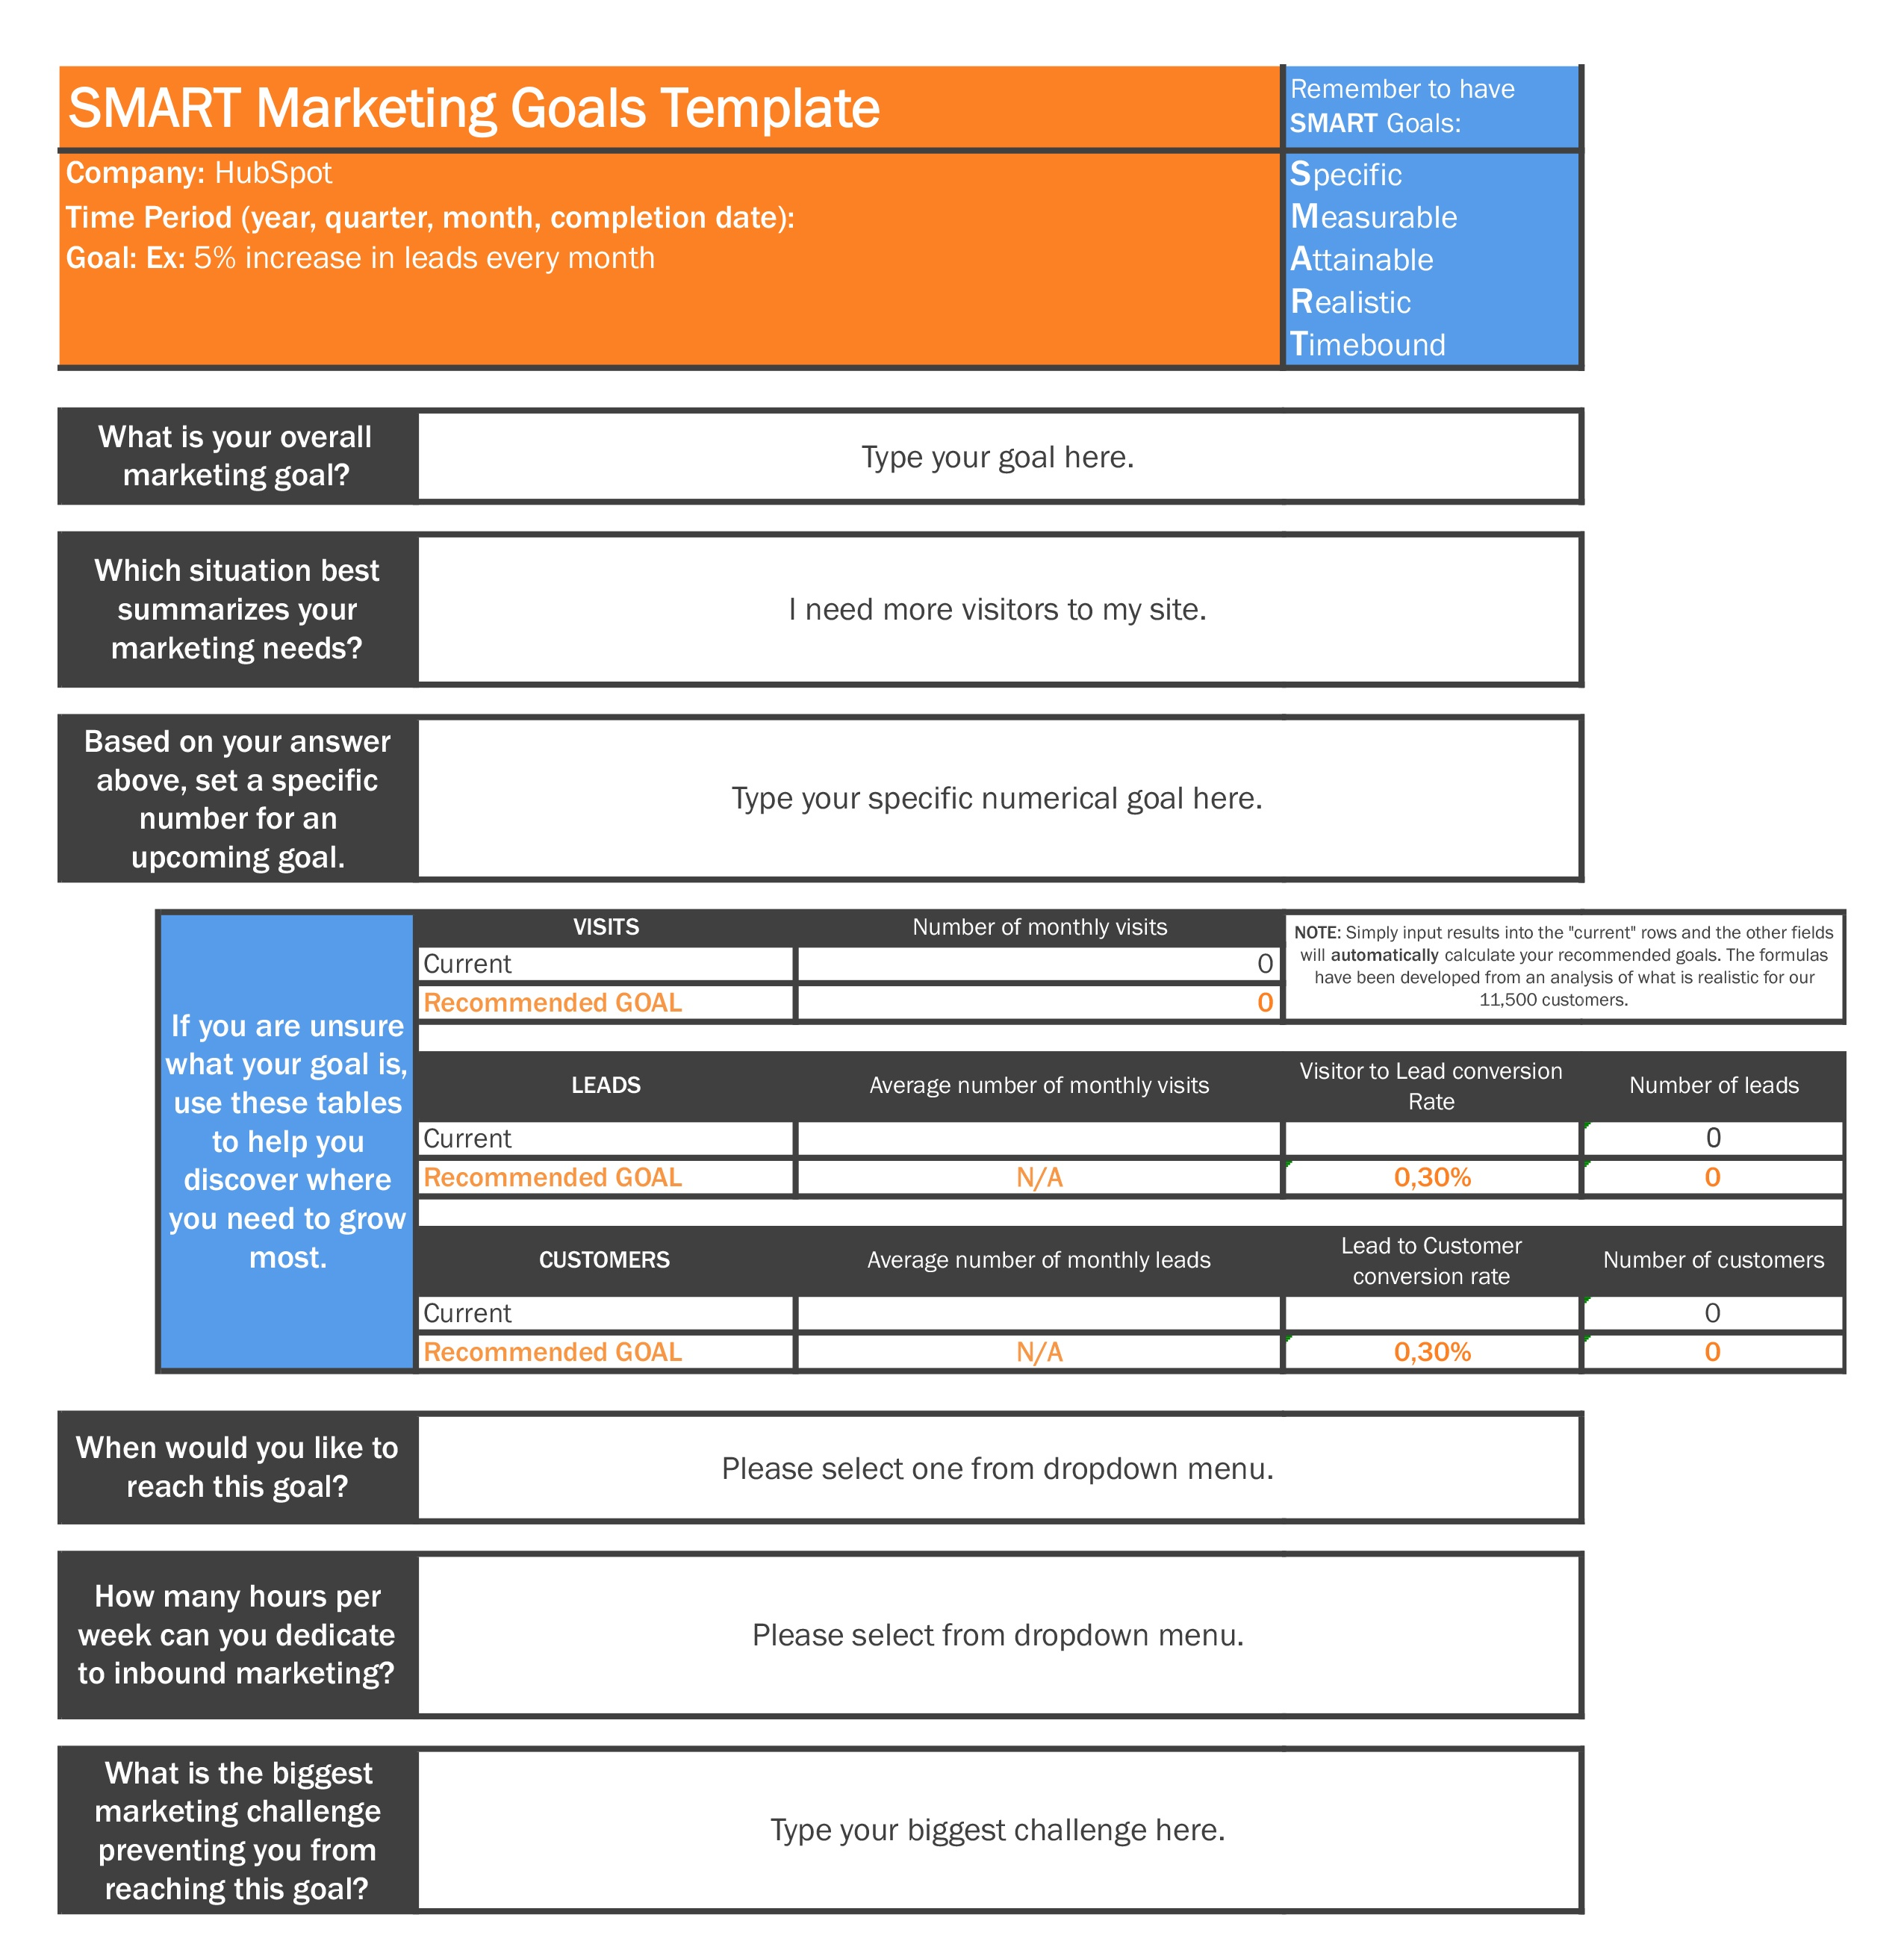 Planifica tus objetivos de marketing SMART